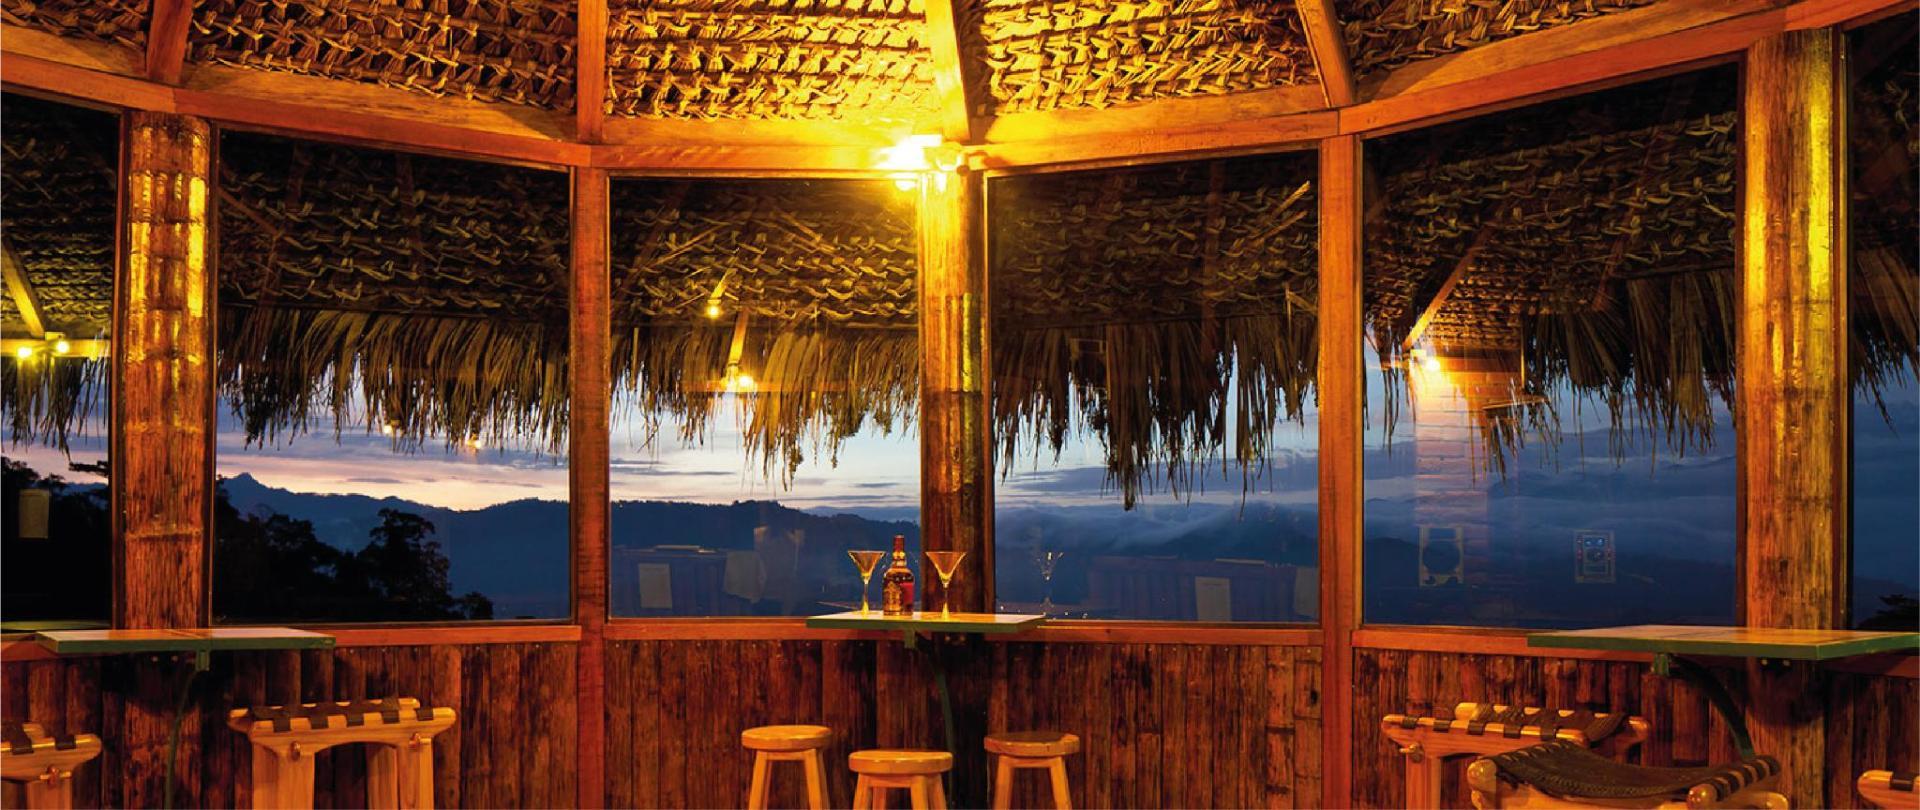 Yumbo-Spa-y-Resort-Hotel-en-Gualea-Bar.jpg